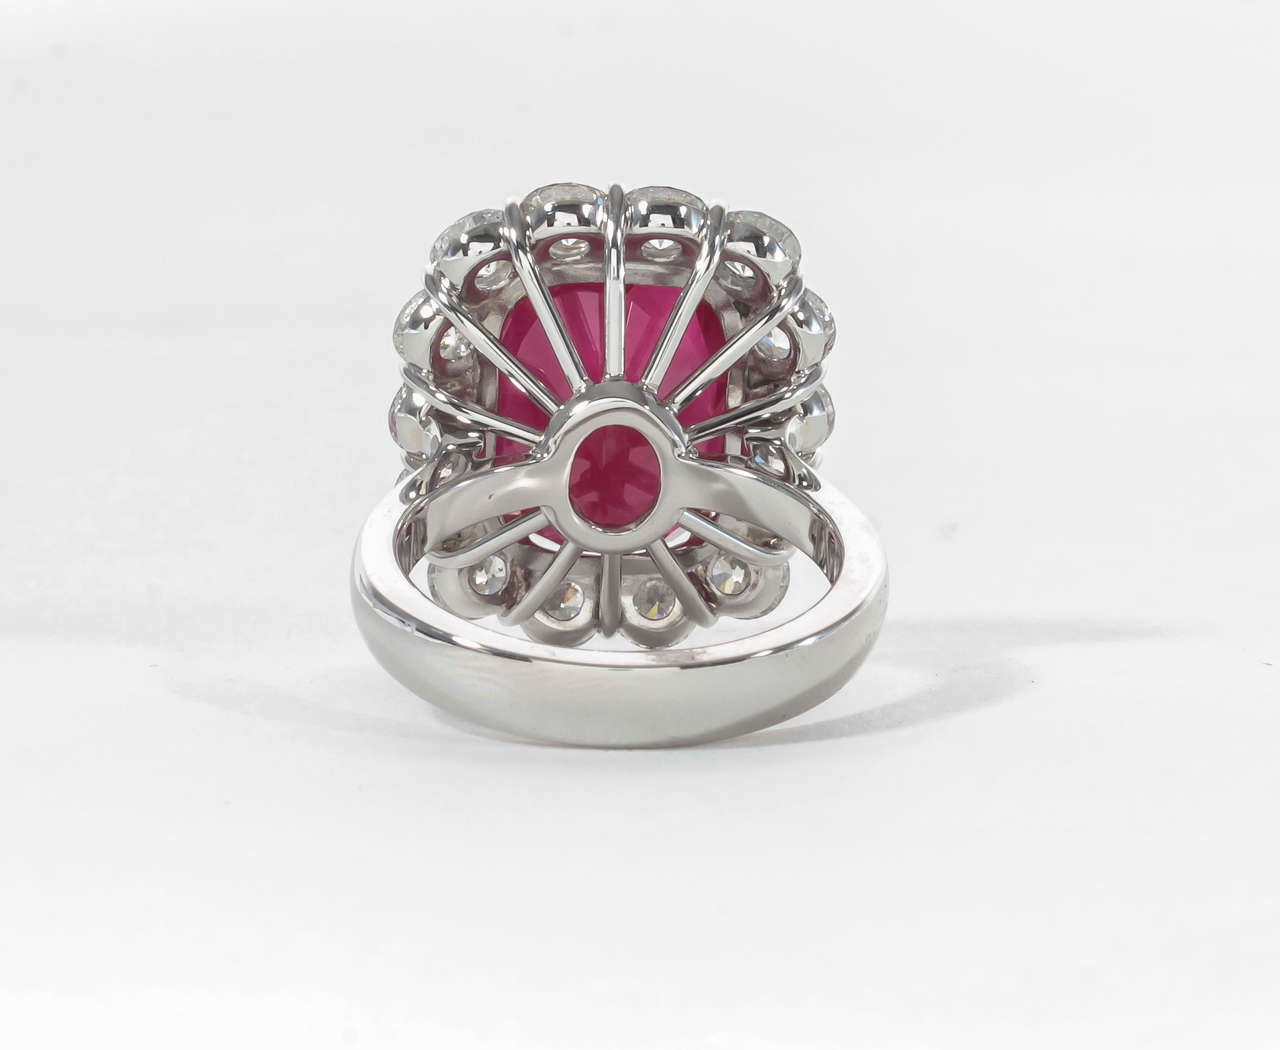 Rare Ten Carat Burma Ruby Diamond Ring image 4